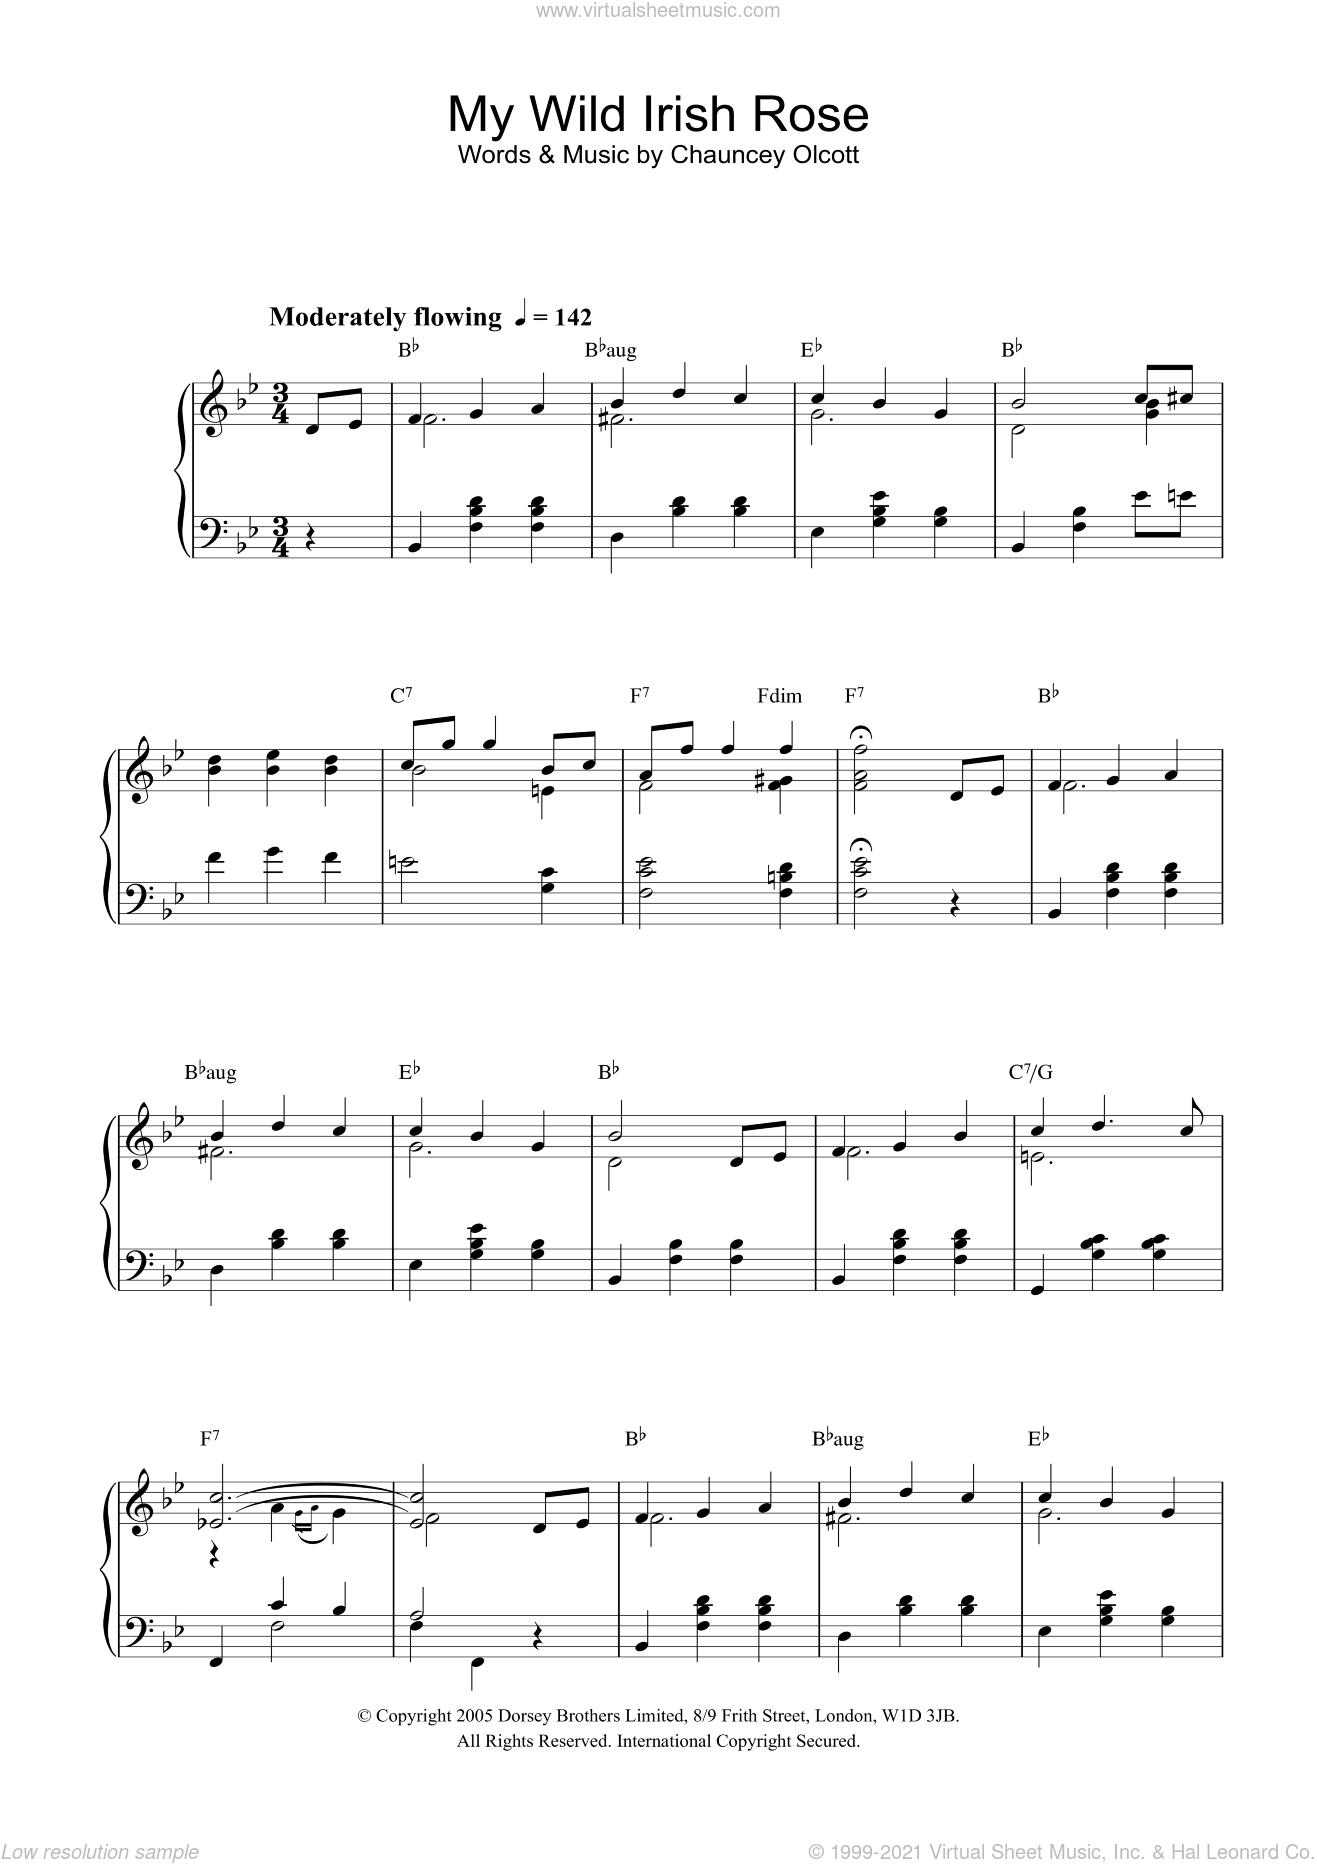 My Wild Irish Rose sheet music for piano solo, intermediate skill level